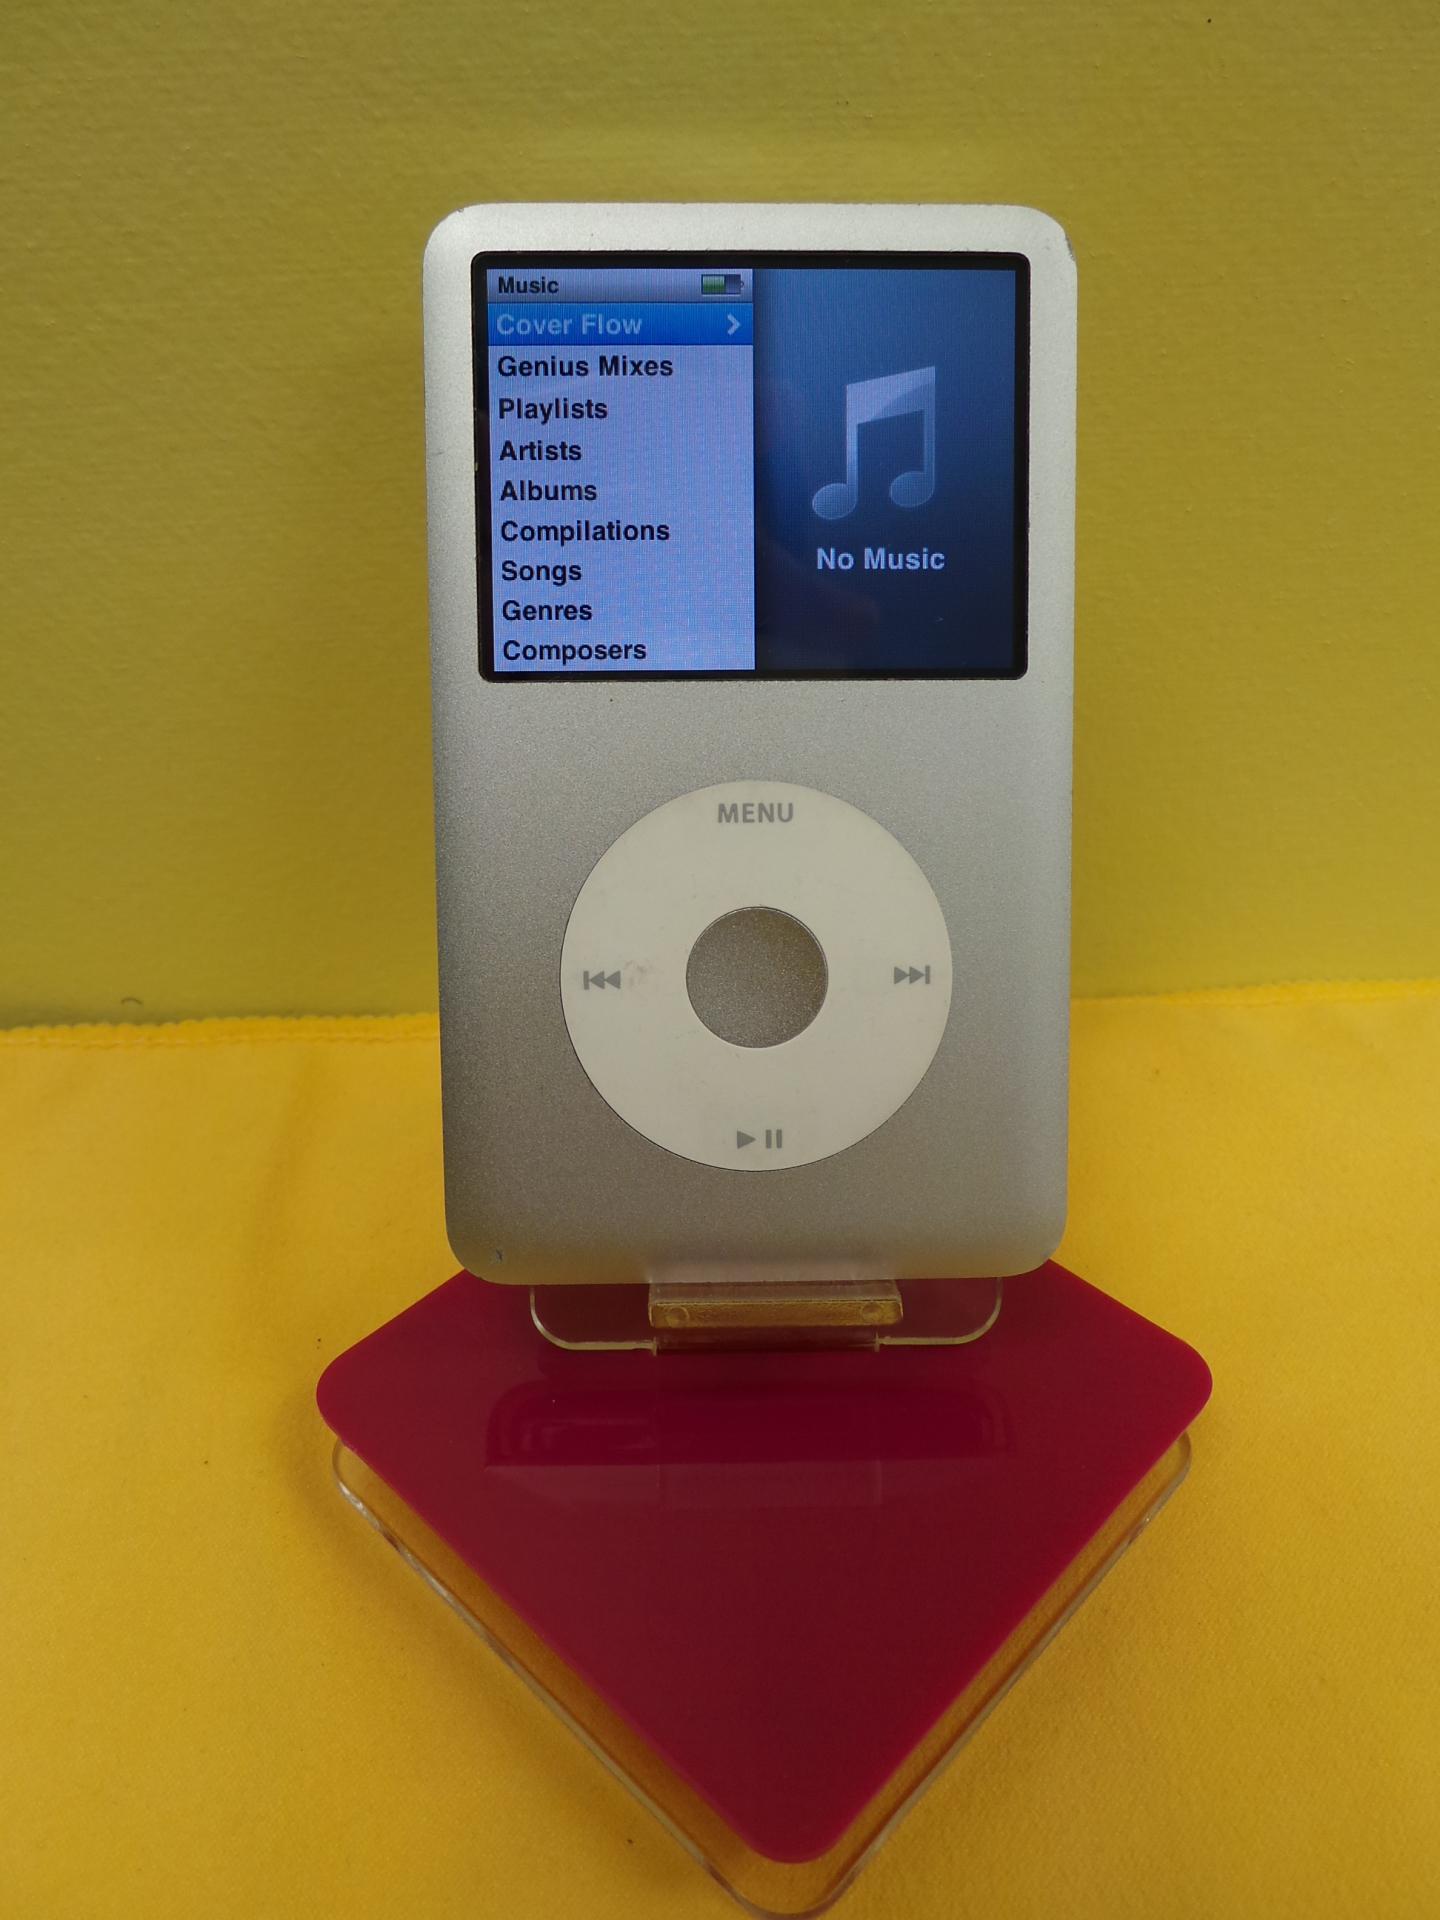 used ipod classic, used ipod 160gb